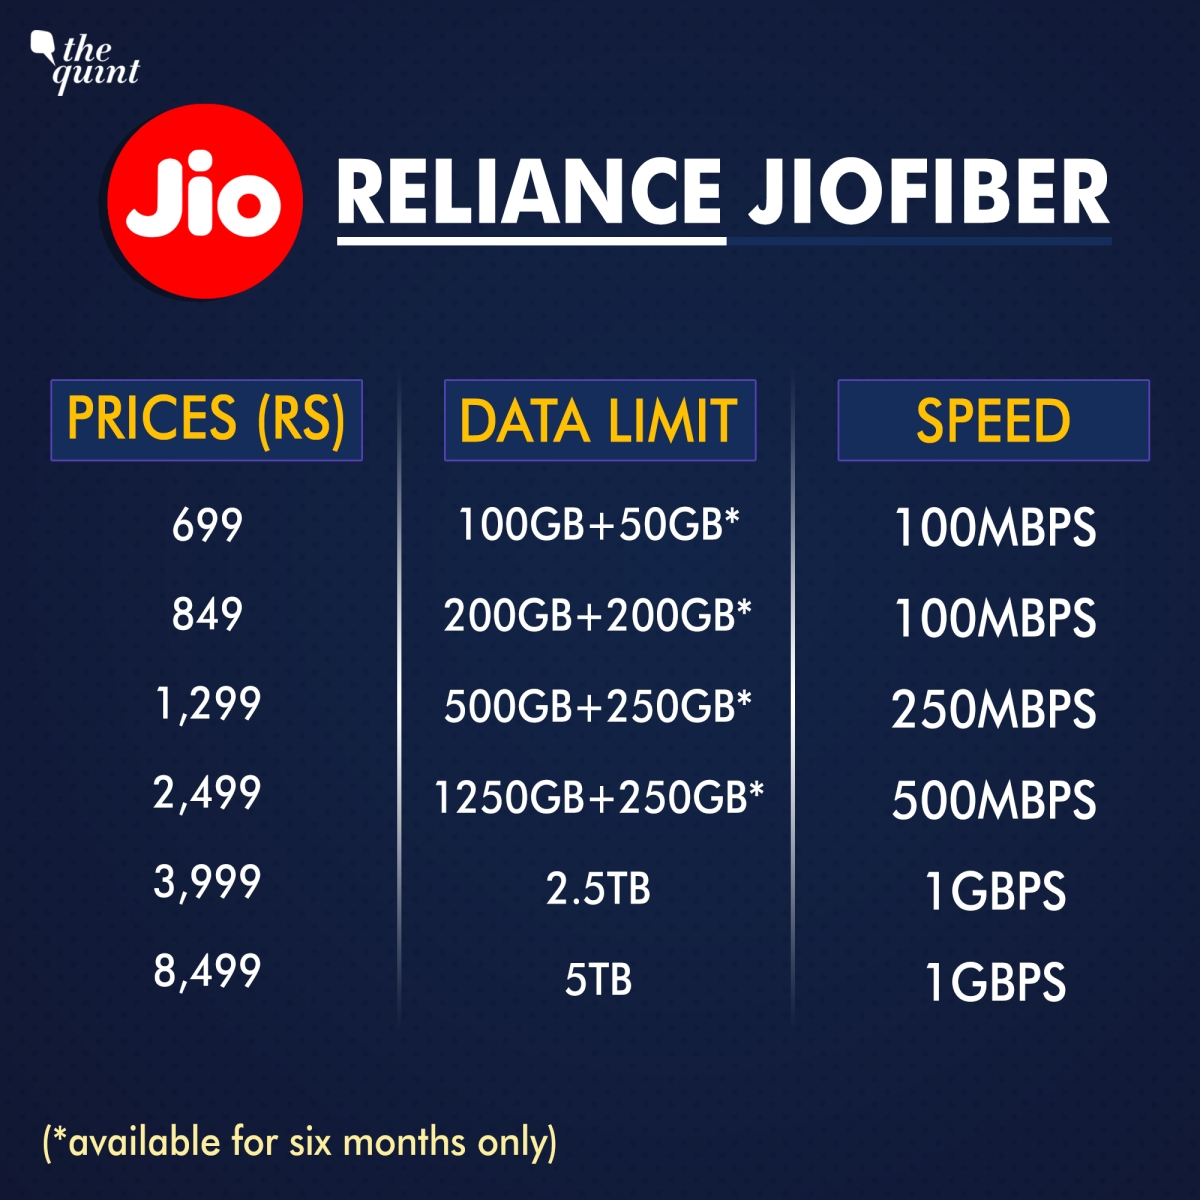 BSNL vs Reliance JioFiber vs Airtel vs ACT Fibrenet Plans